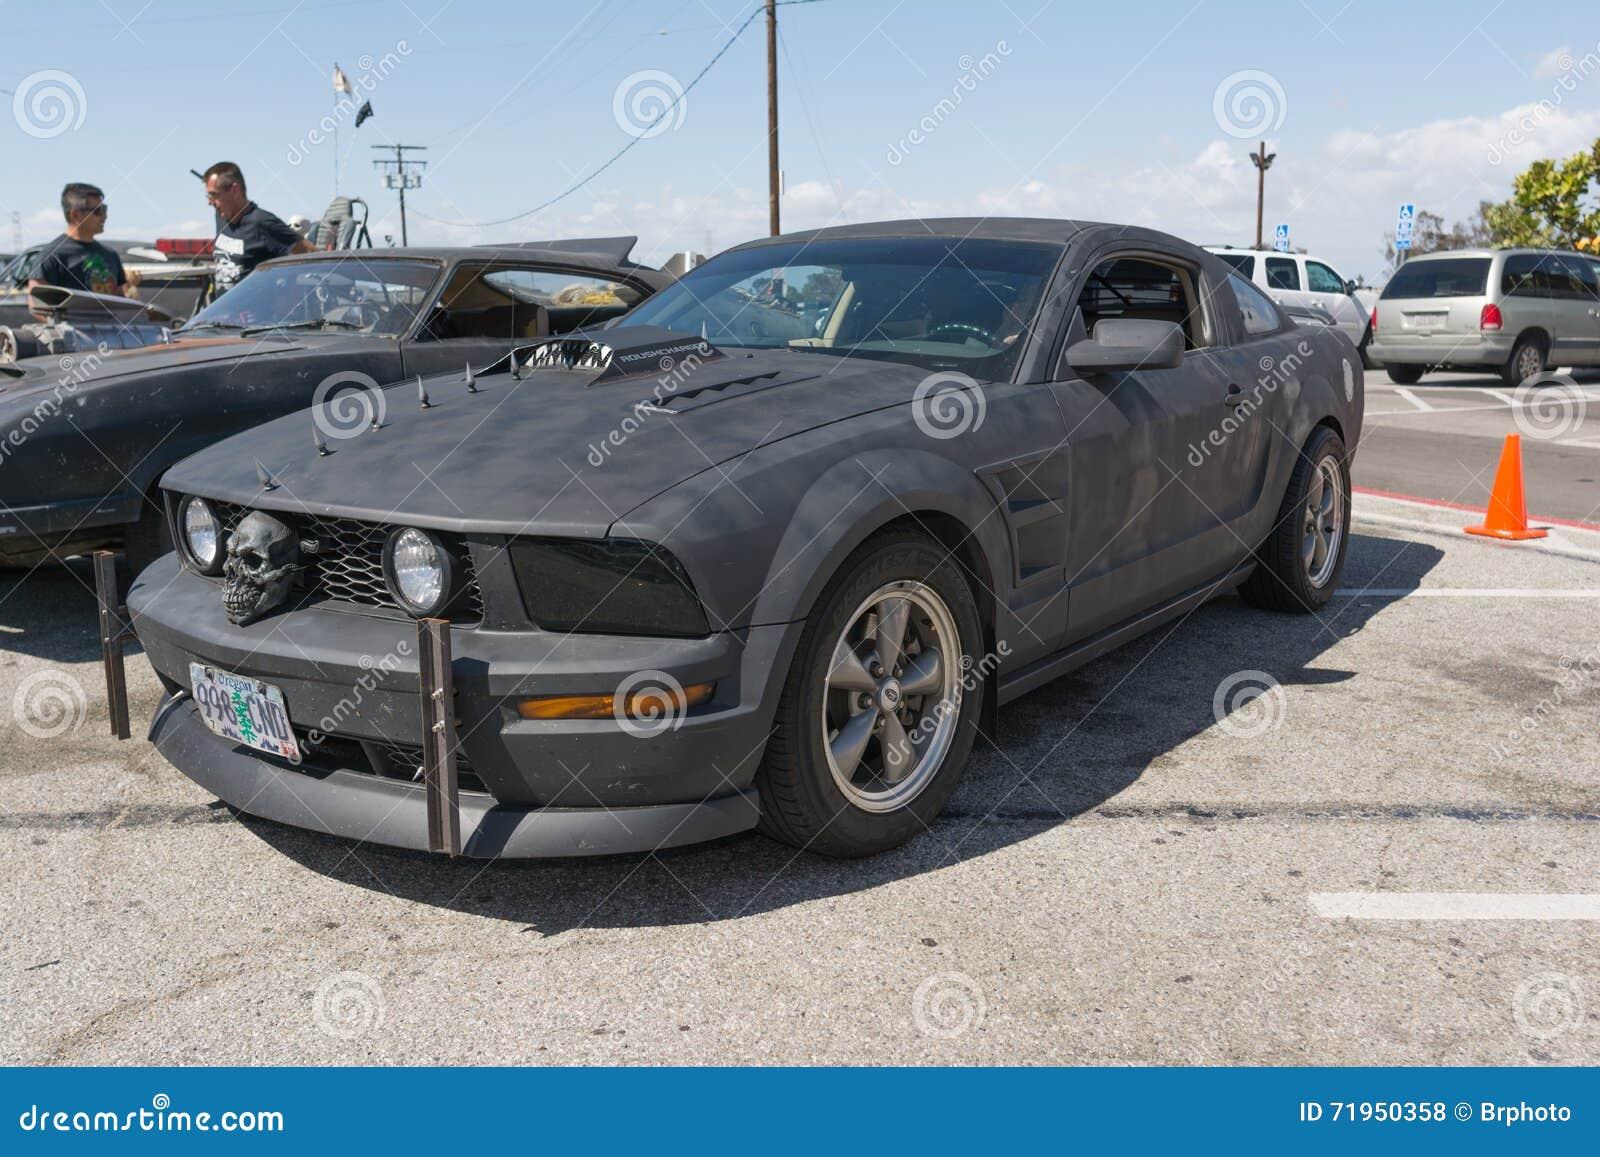 Used Cars Torrance